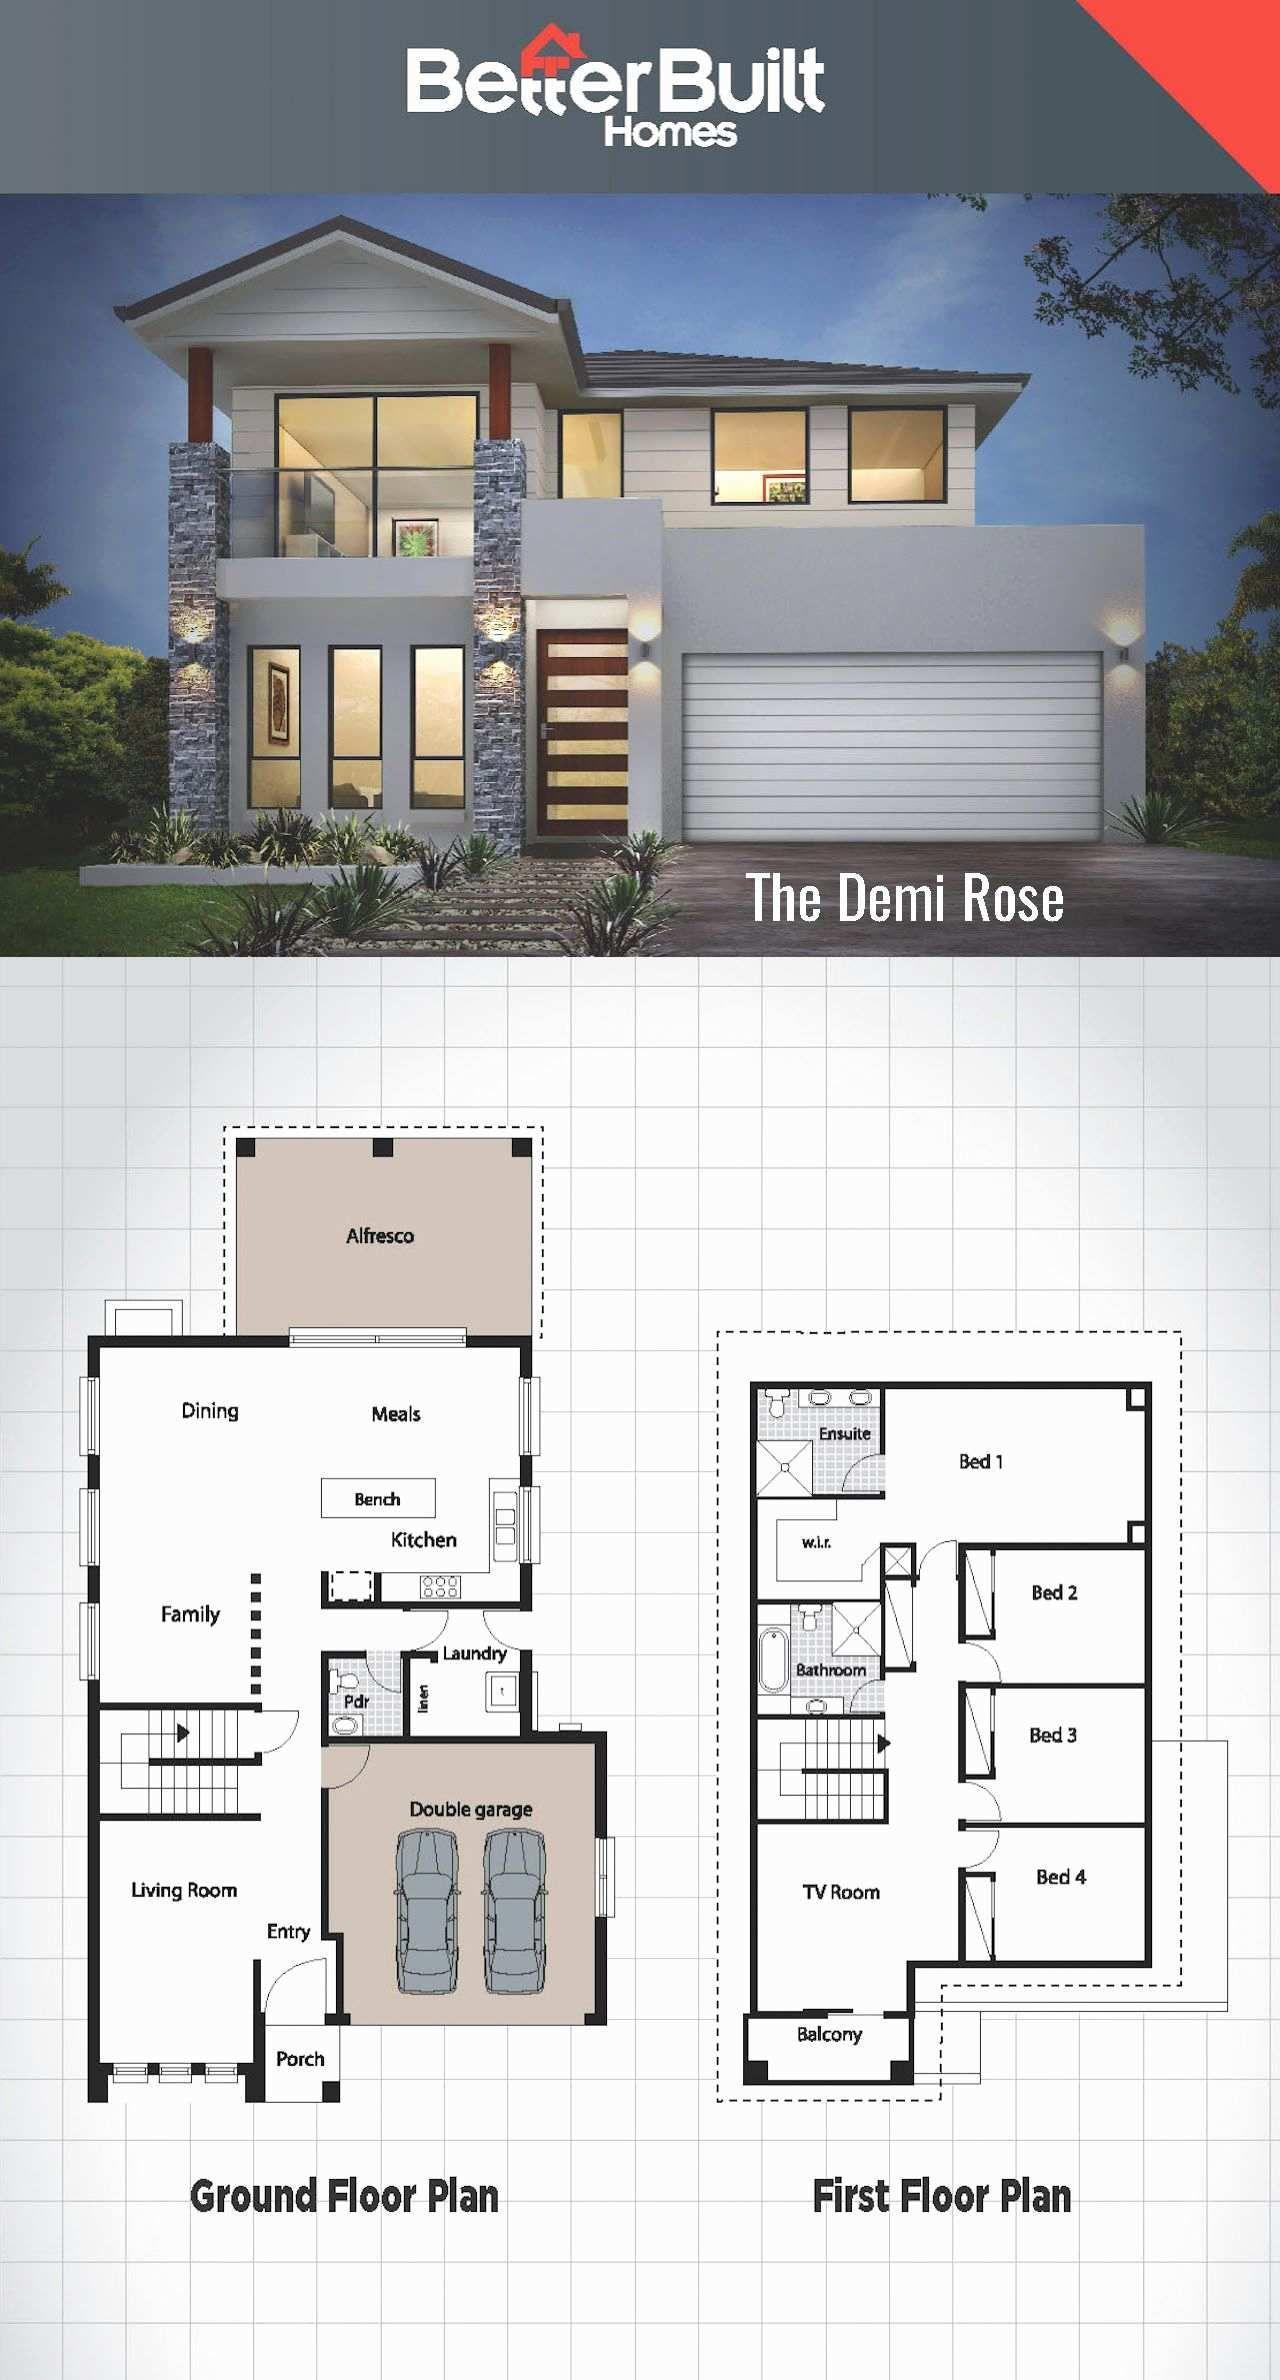 Betterbuilt Homes The Demi Rose Design Floorplans House Plans Farmhouse Dream House Plans House Blueprints